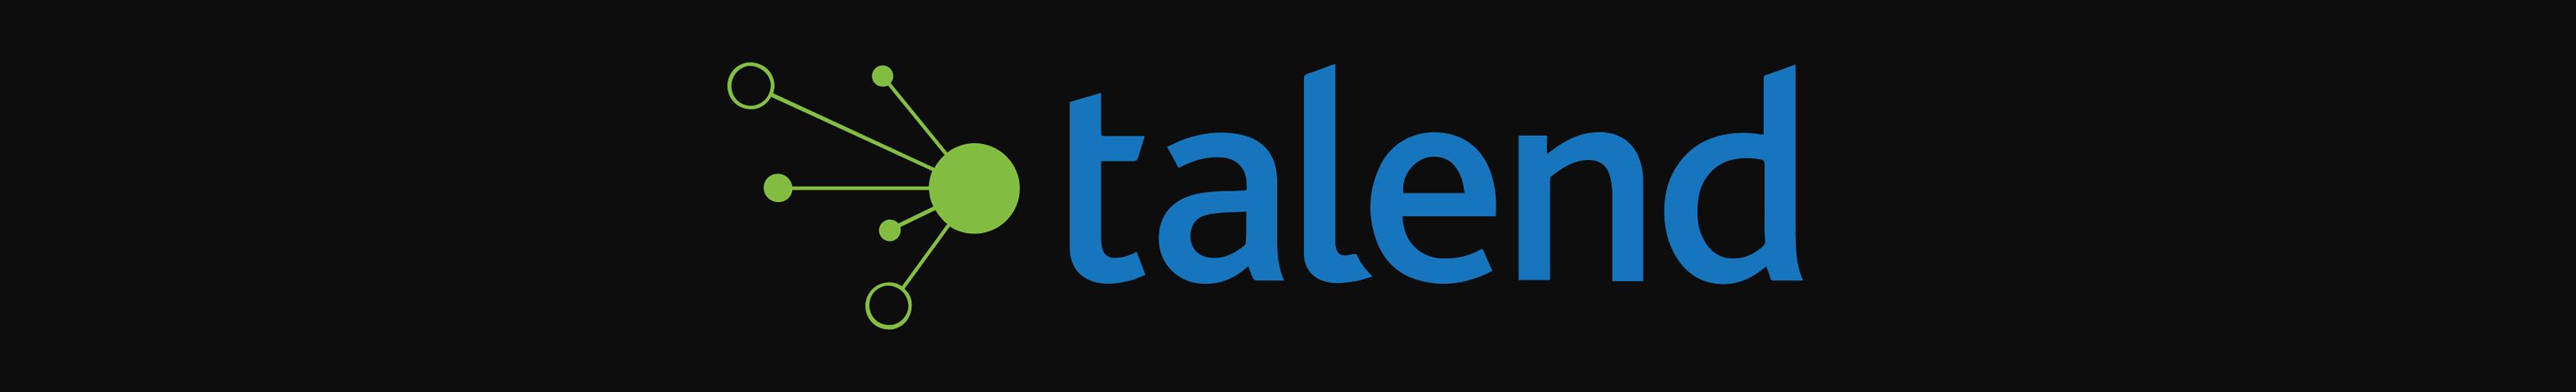 Talend Logo - Top 10 Data Analytics Tools - Edureka